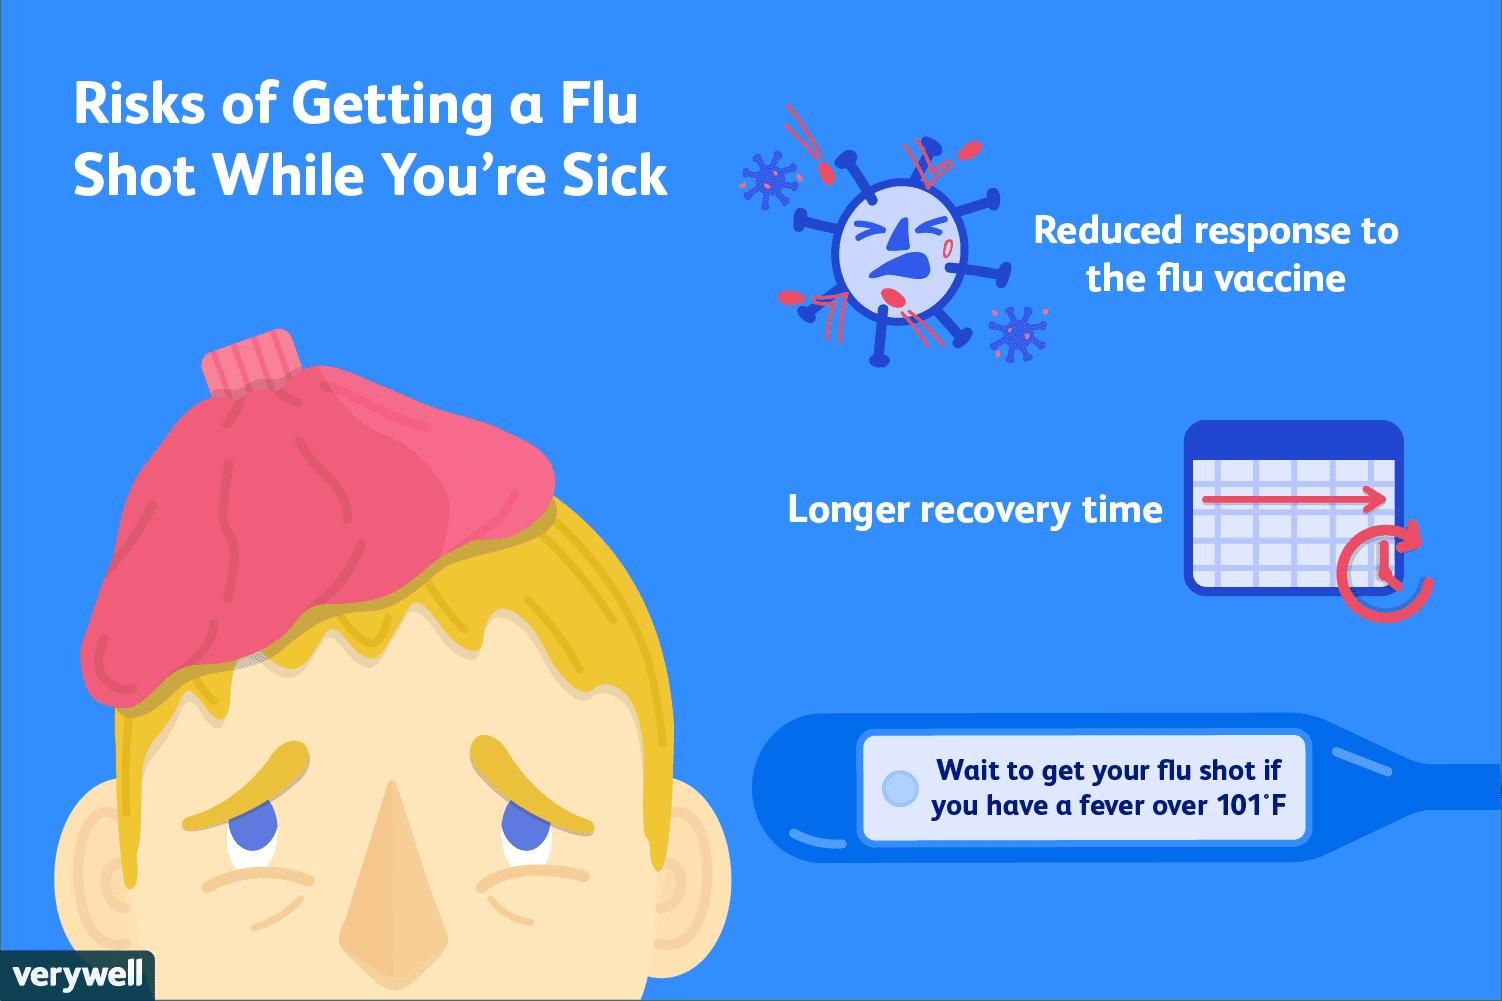 Can I Get A Flu Shot While Sick?